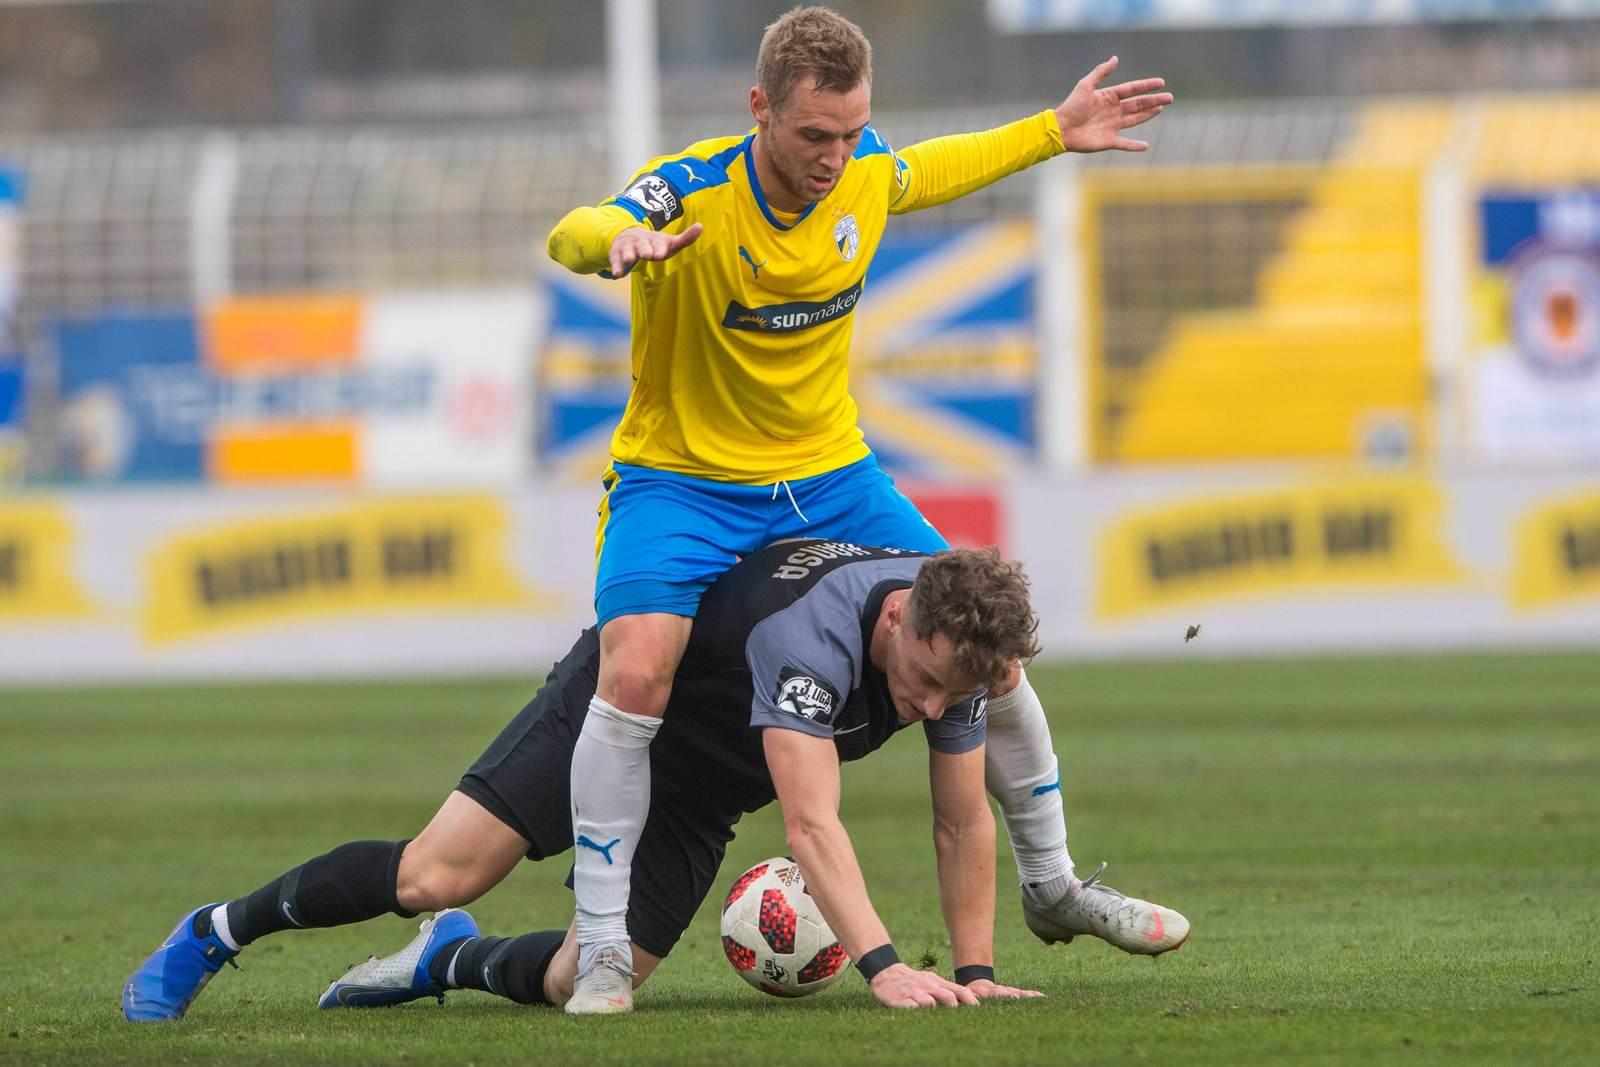 Felix Brügmann gegen Mirnes Pepic im Zweikampf